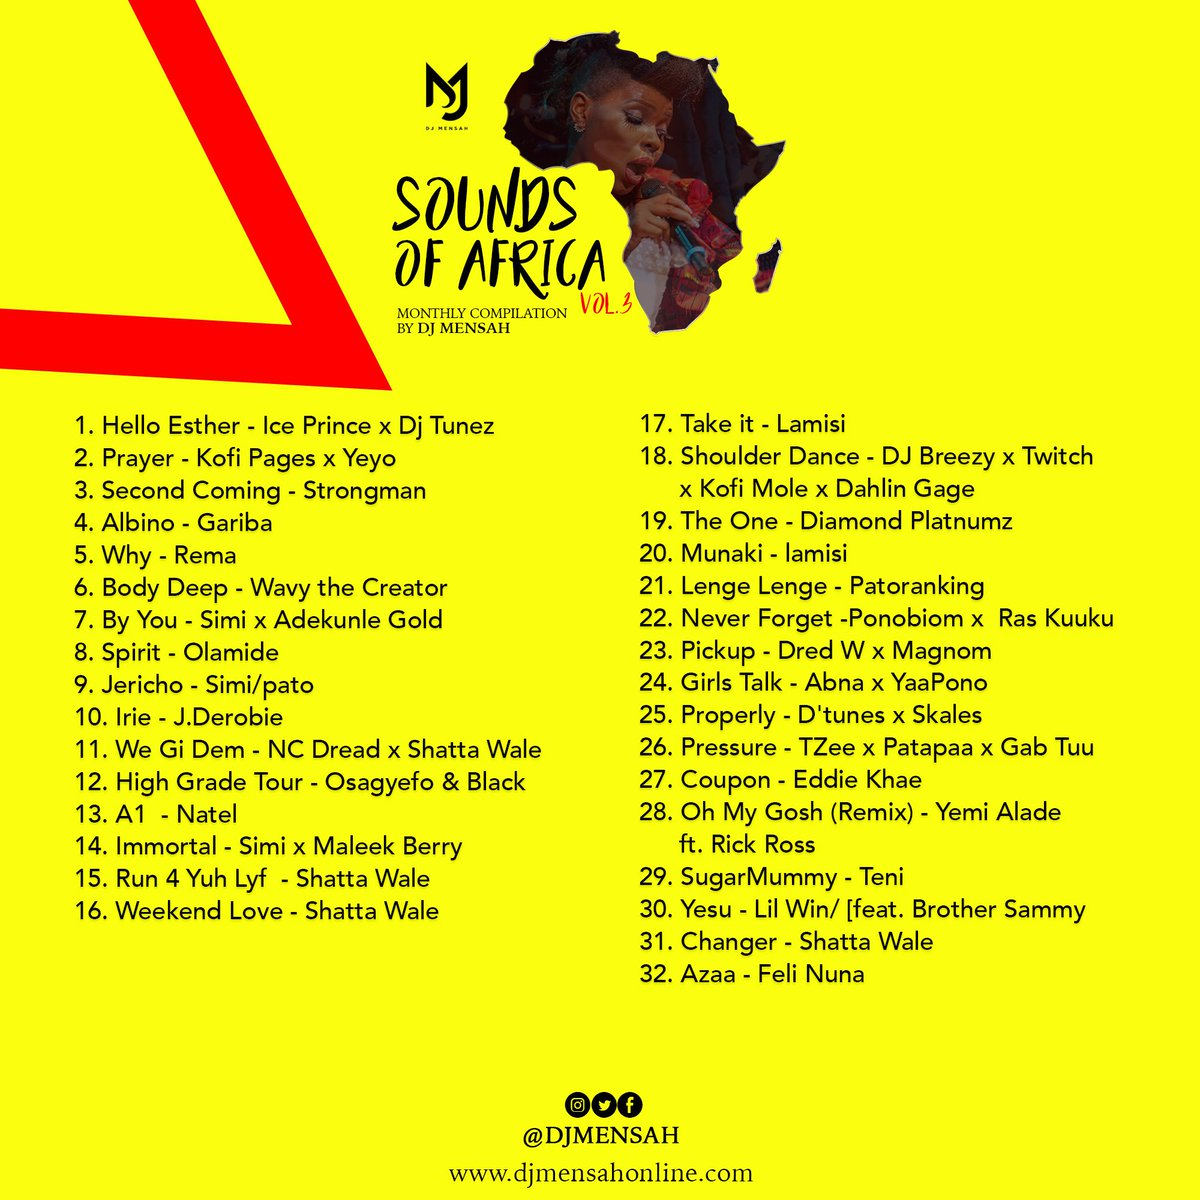 31.Changer - @shattawalegh   https://soundcloud.com/dj_mensah/sounds-of-africa-vol-3/s-K6hhn…  https://podcasts.apple.com/gh/podcast/sounds-of-africa-vol-3-march/id1466720746?i=1000441977281…  #SoundsOfAfrica19 #MonthlyCompilation #SOA #ThisIsNotAMixtape #VacWithDjMensah19